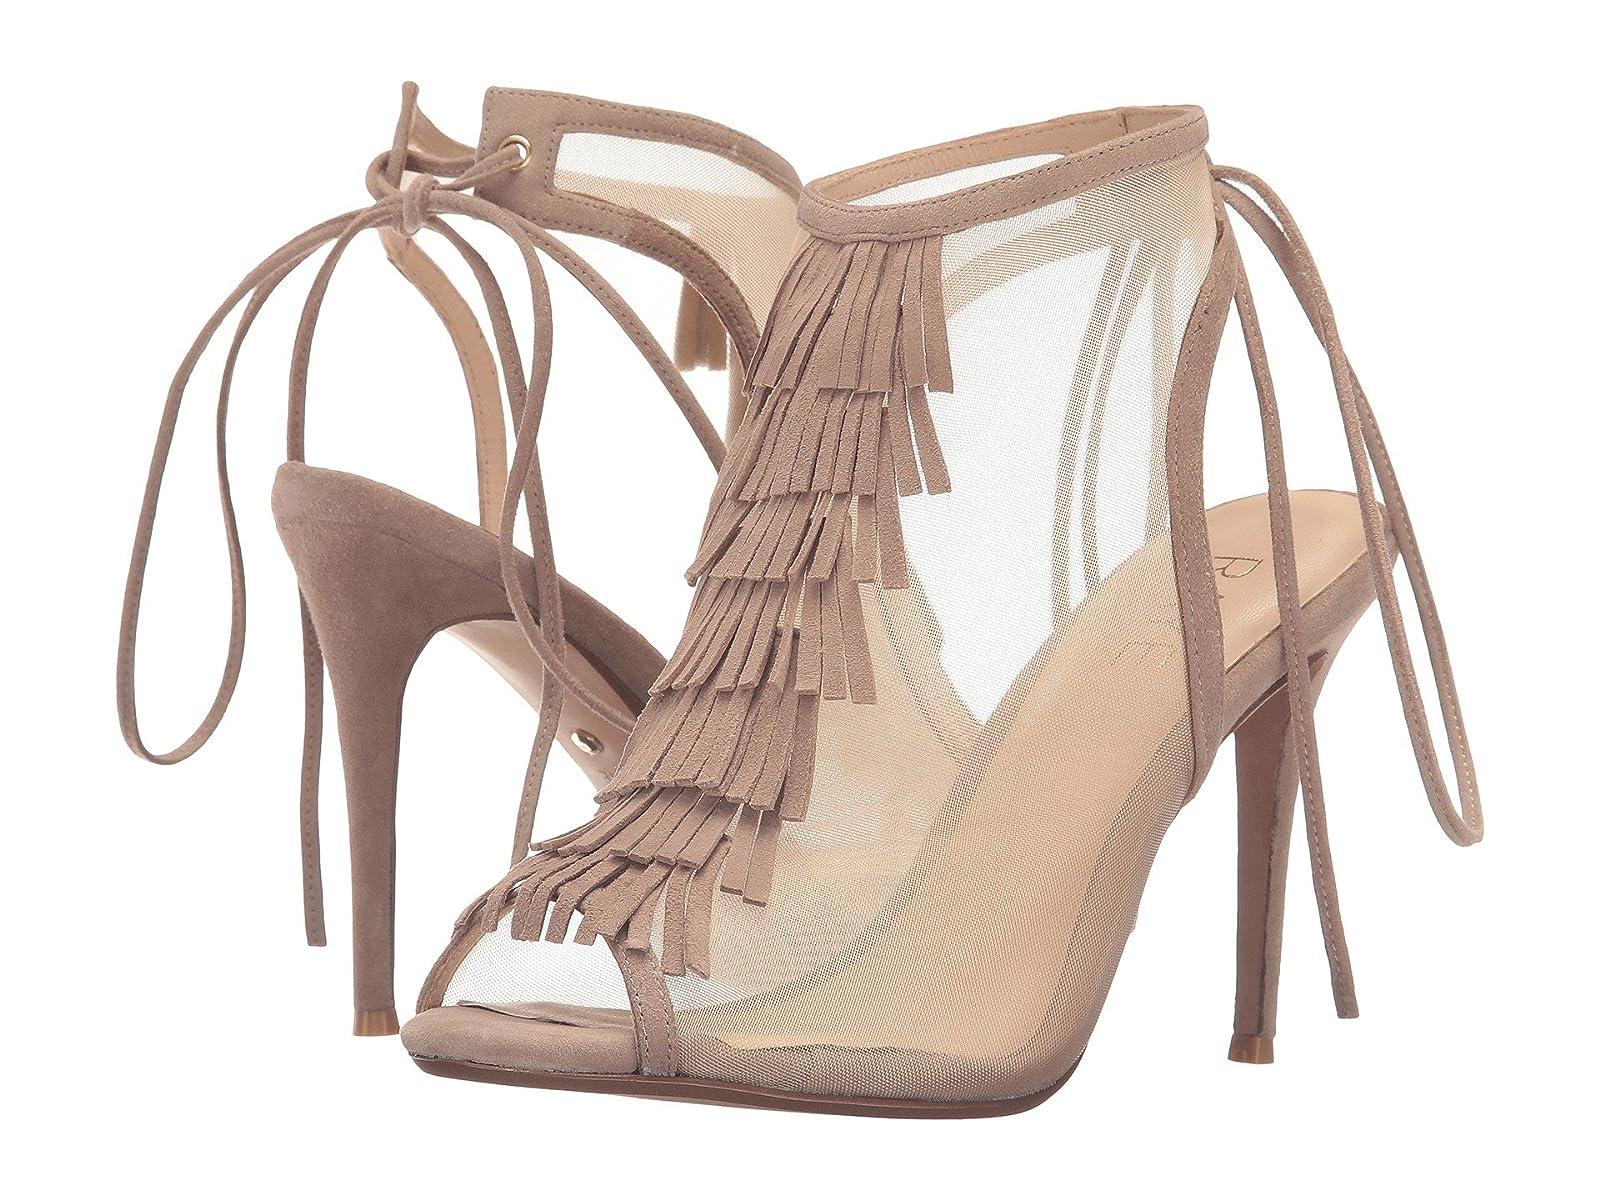 RAYE BaileyCheap and distinctive eye-catching shoes